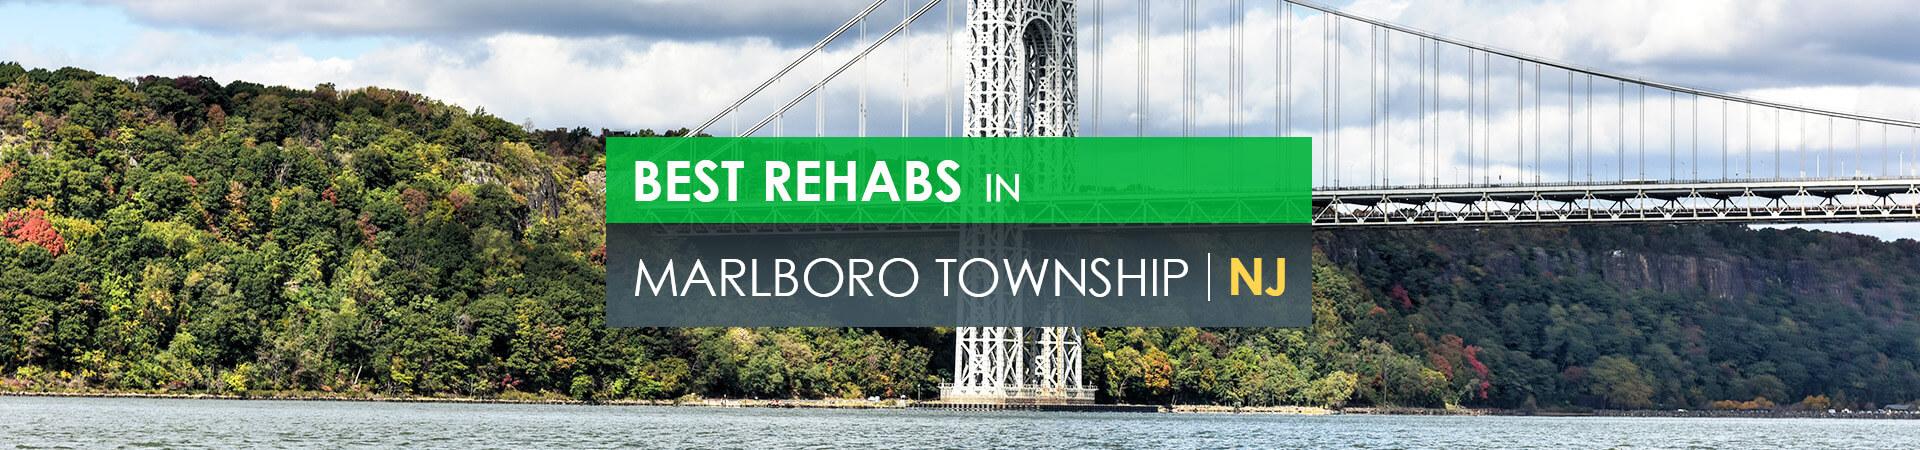 Best rehabs in Marlboro Township, NJ